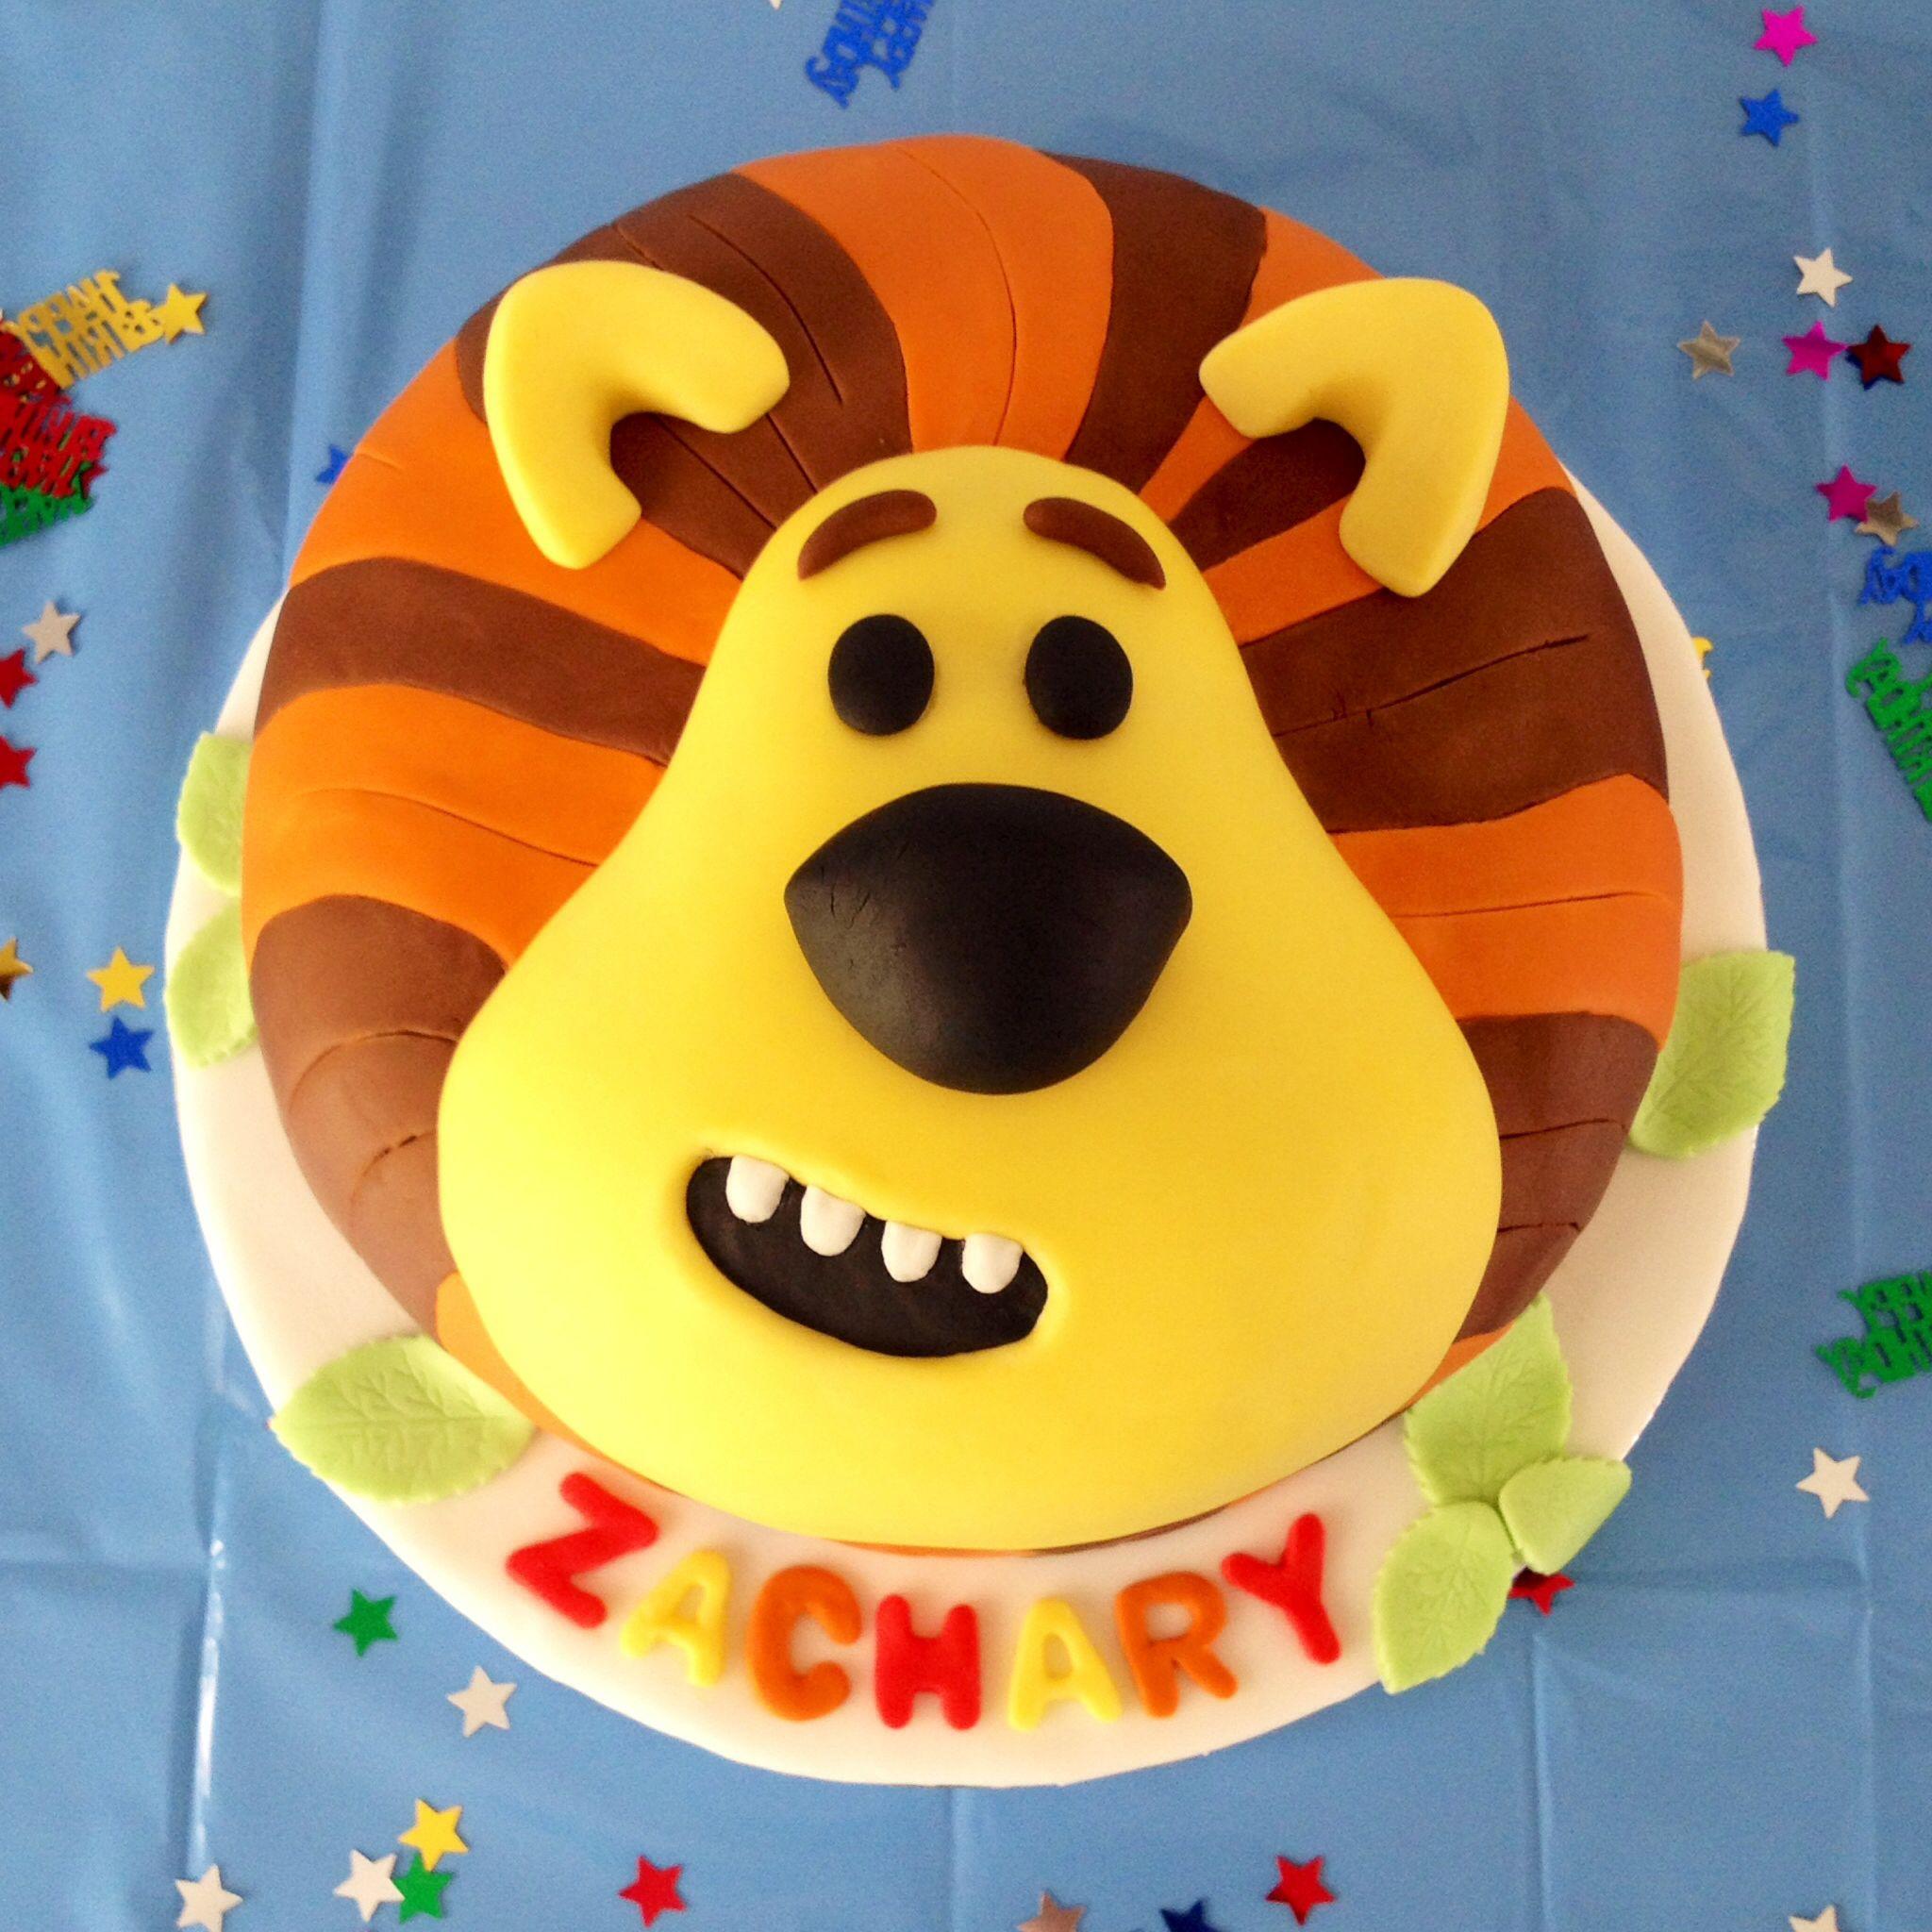 Zachs 1st Birthday Cake Raa Raa The Noisy Lion From Cbeebies